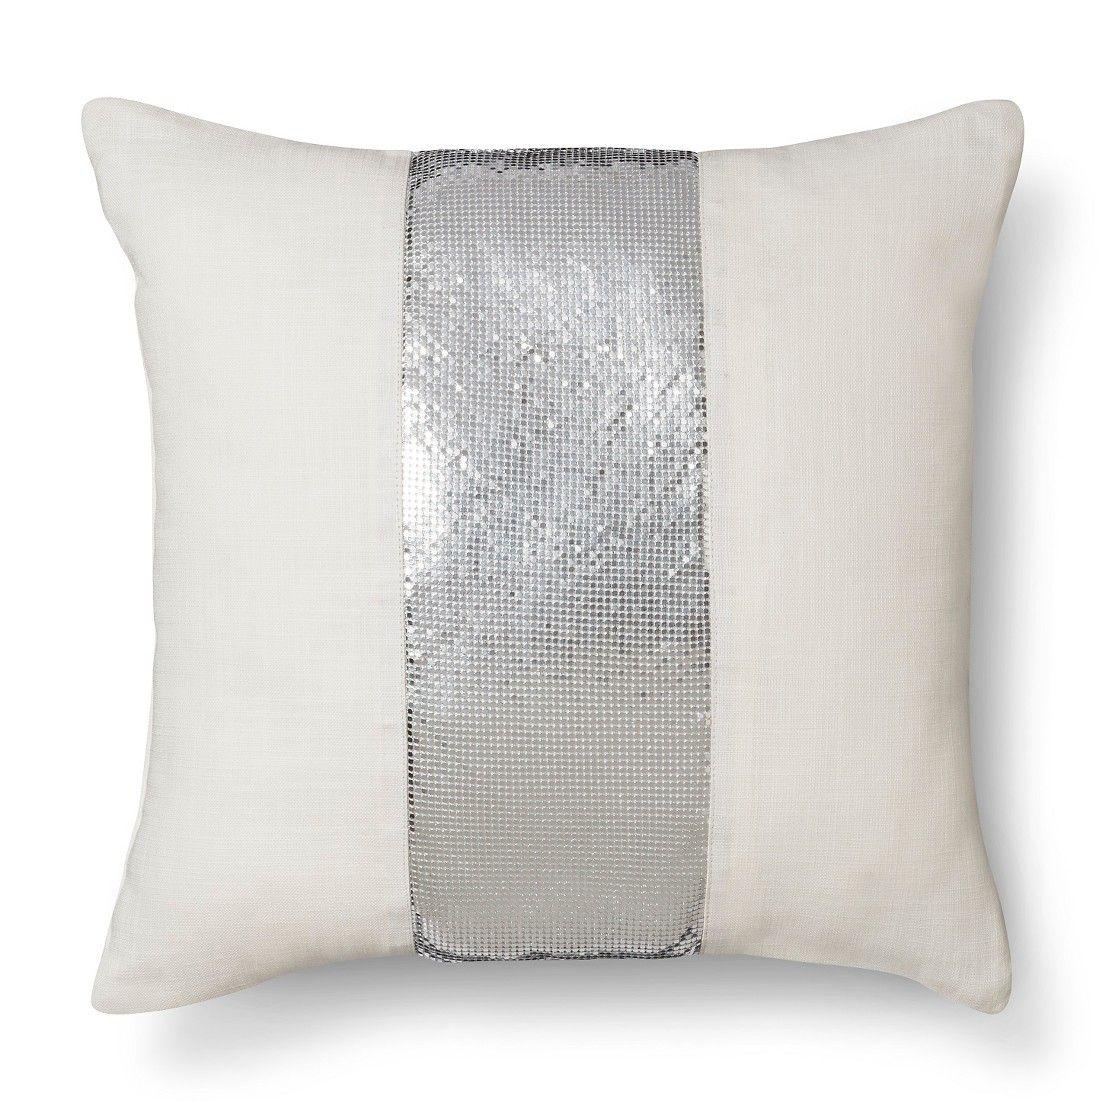 Nate Berkus� Metallic Mesh Pillow - White